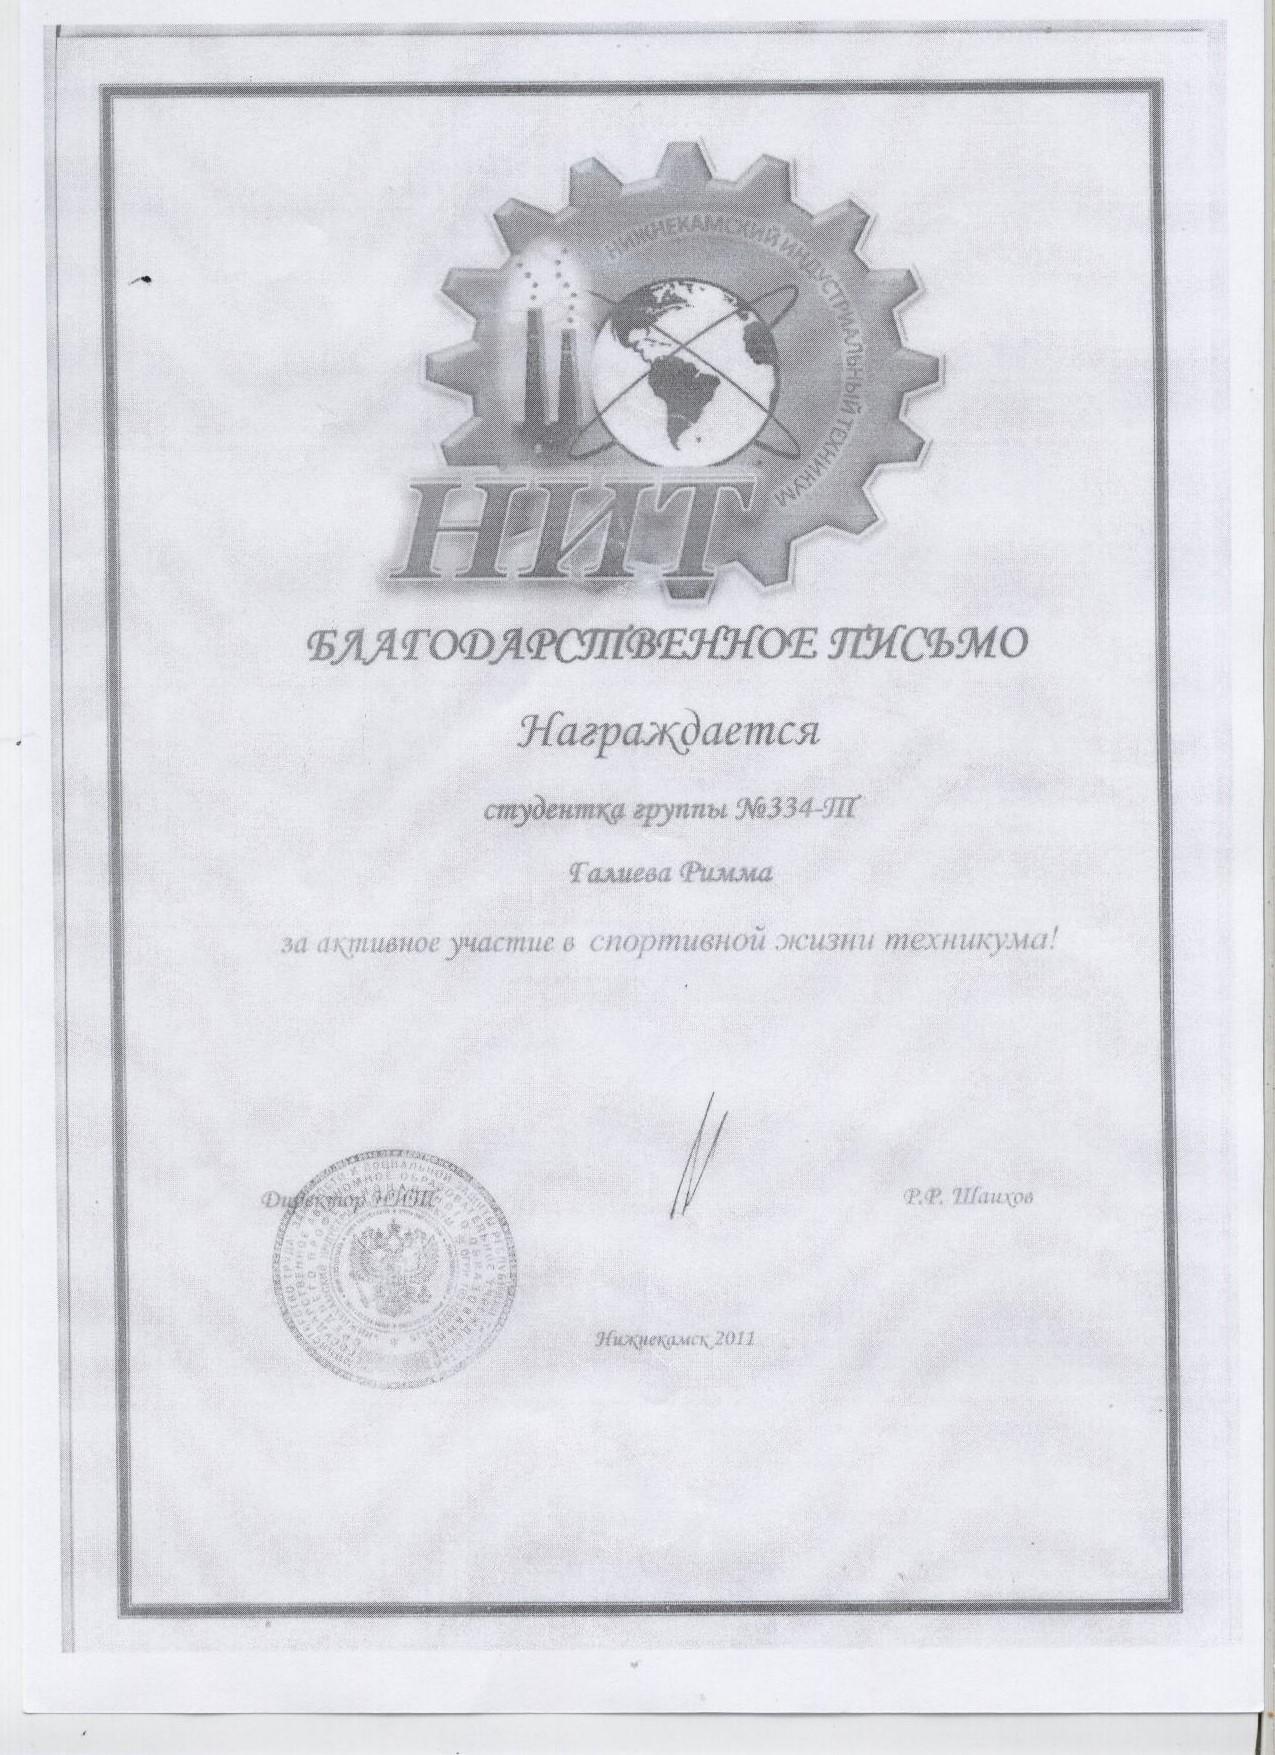 F:\Всероссйский конкурс Портфолио выпускника\РИММА\Римма 011.jpg